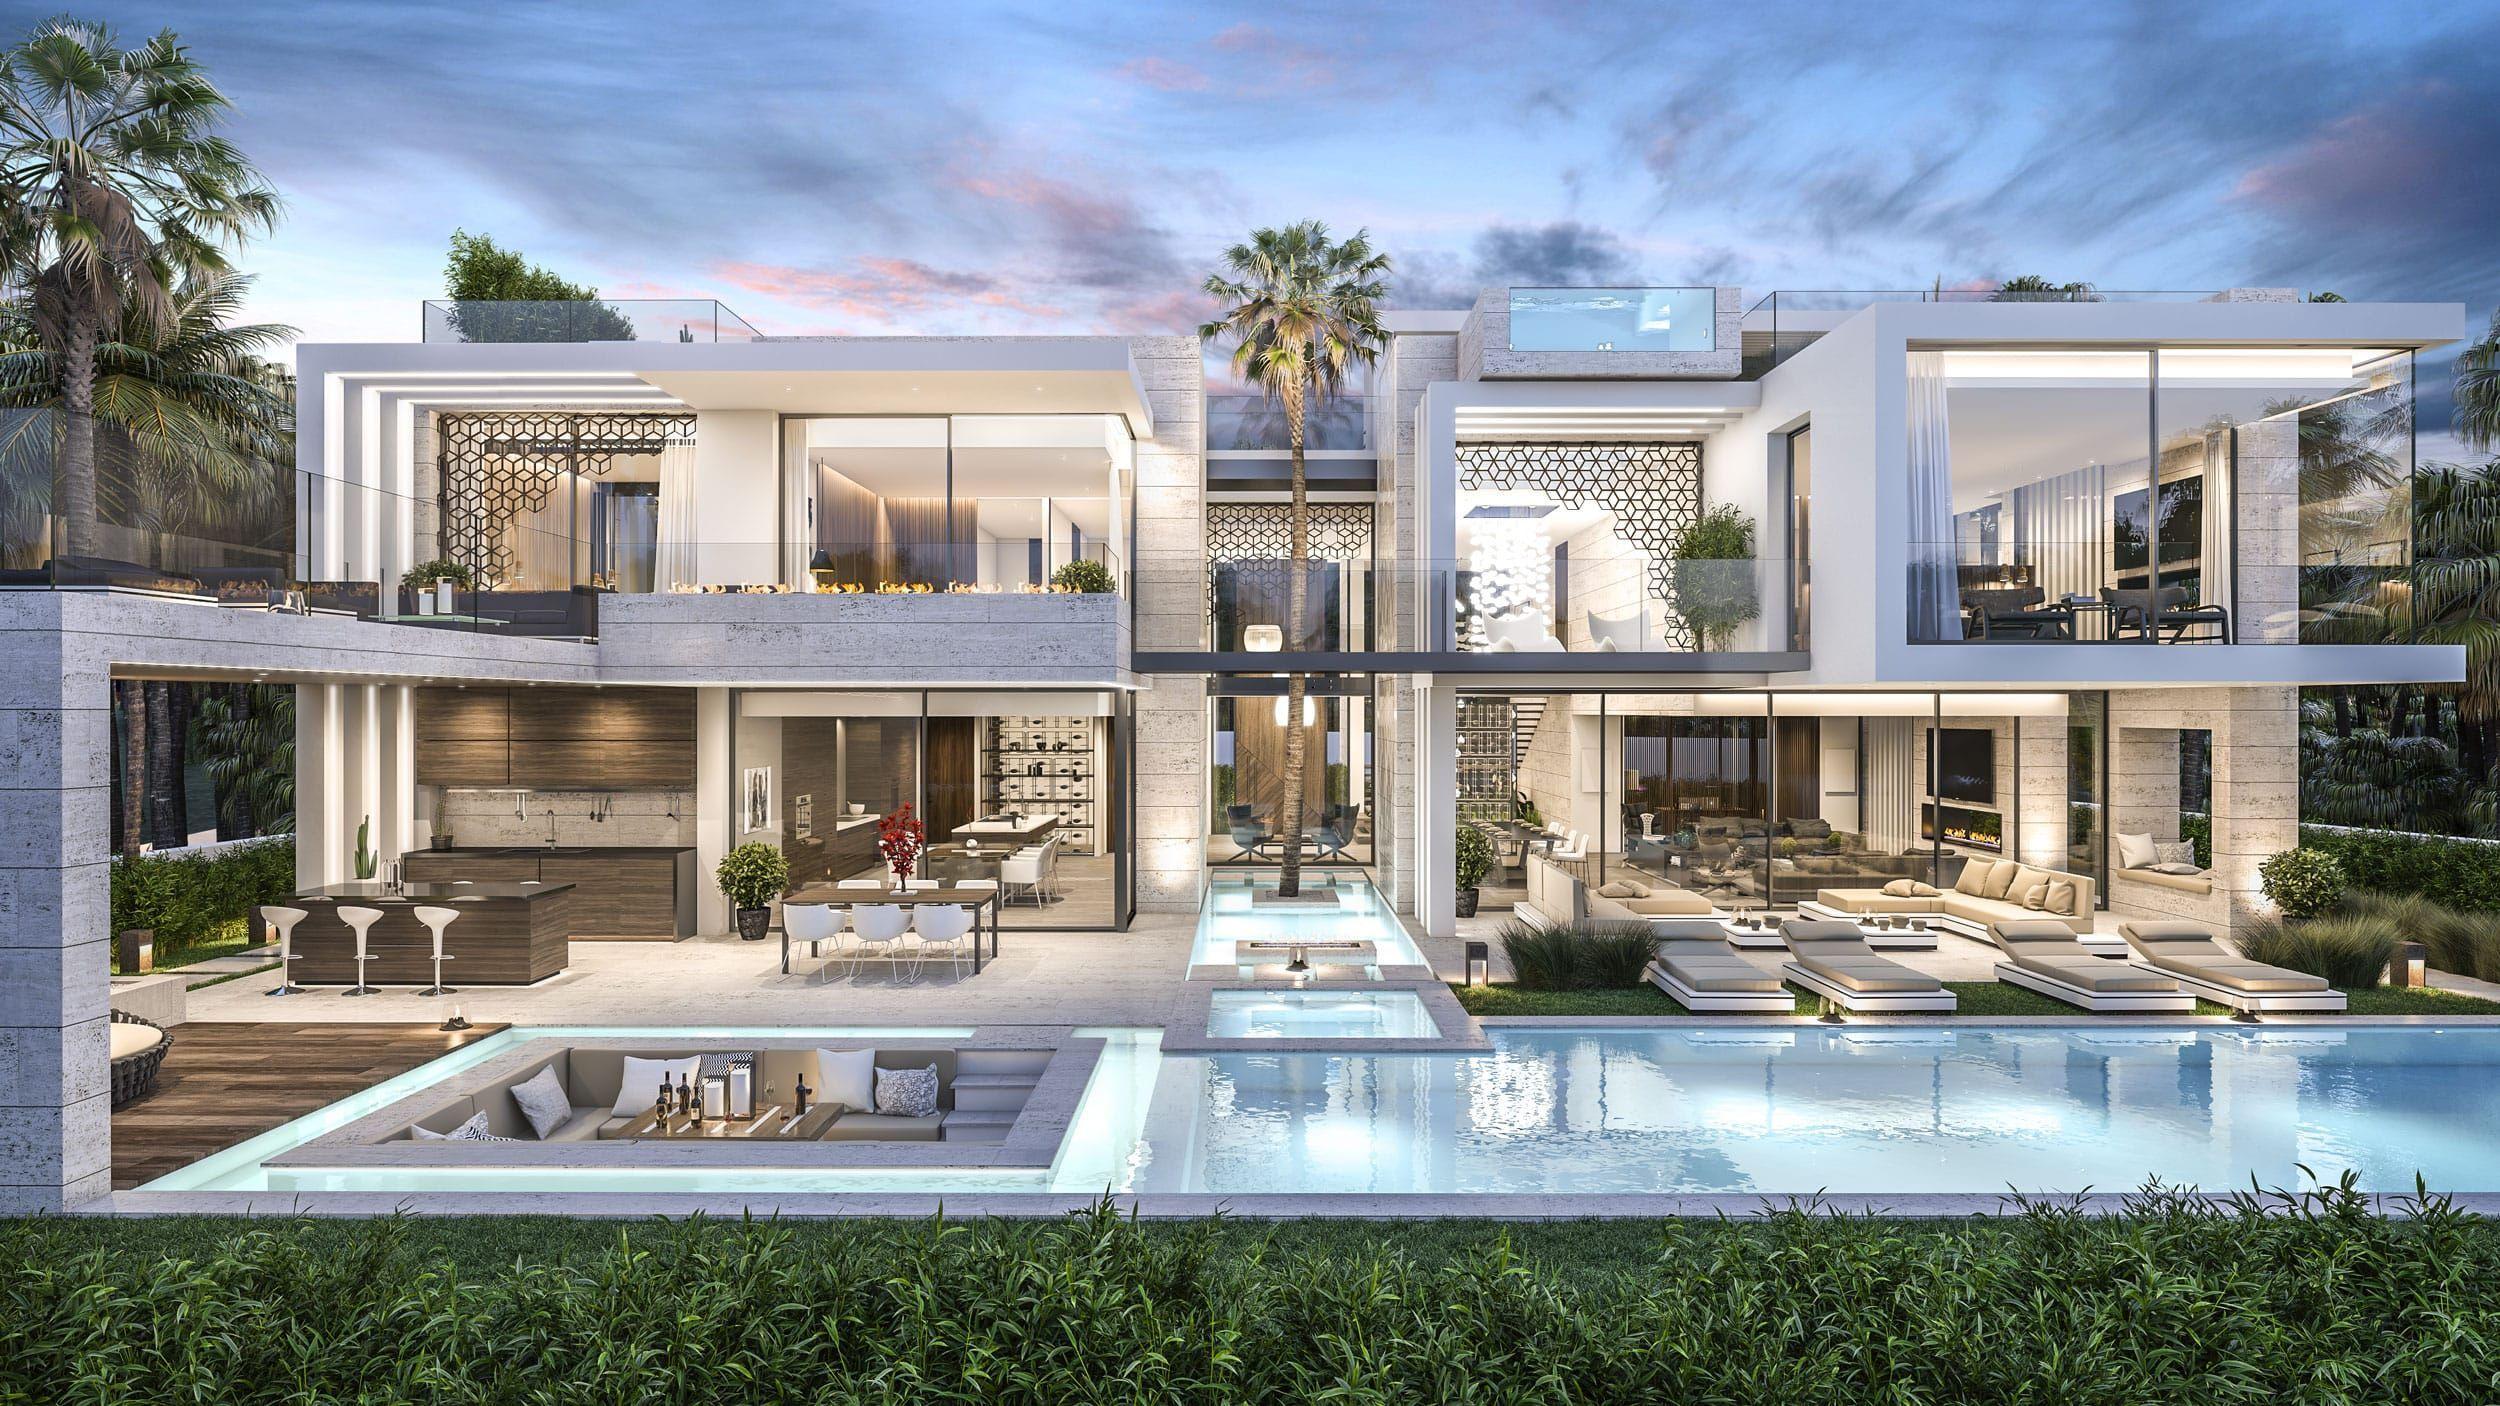 Villa Jumeirah, Dubai | B8 Architecture and Design Studio